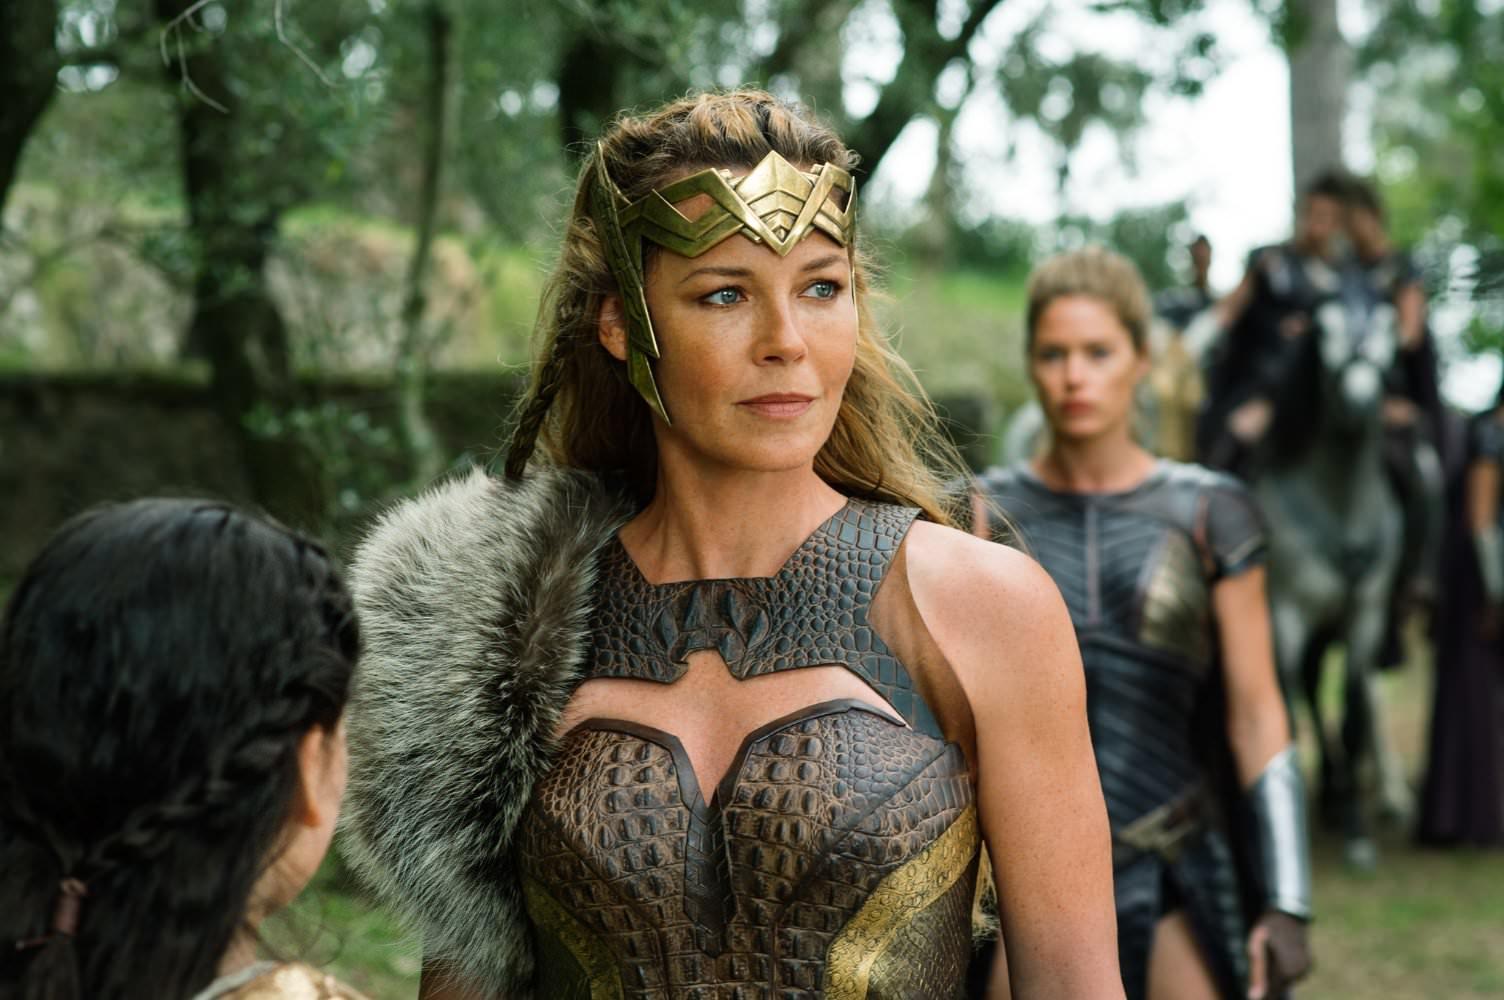 Movie, Wonder Woman(美國, 2017年) / 神力女超人(台灣) / 神奇女侠(中國) / 神奇女俠(香港), 電影角色與演員介紹